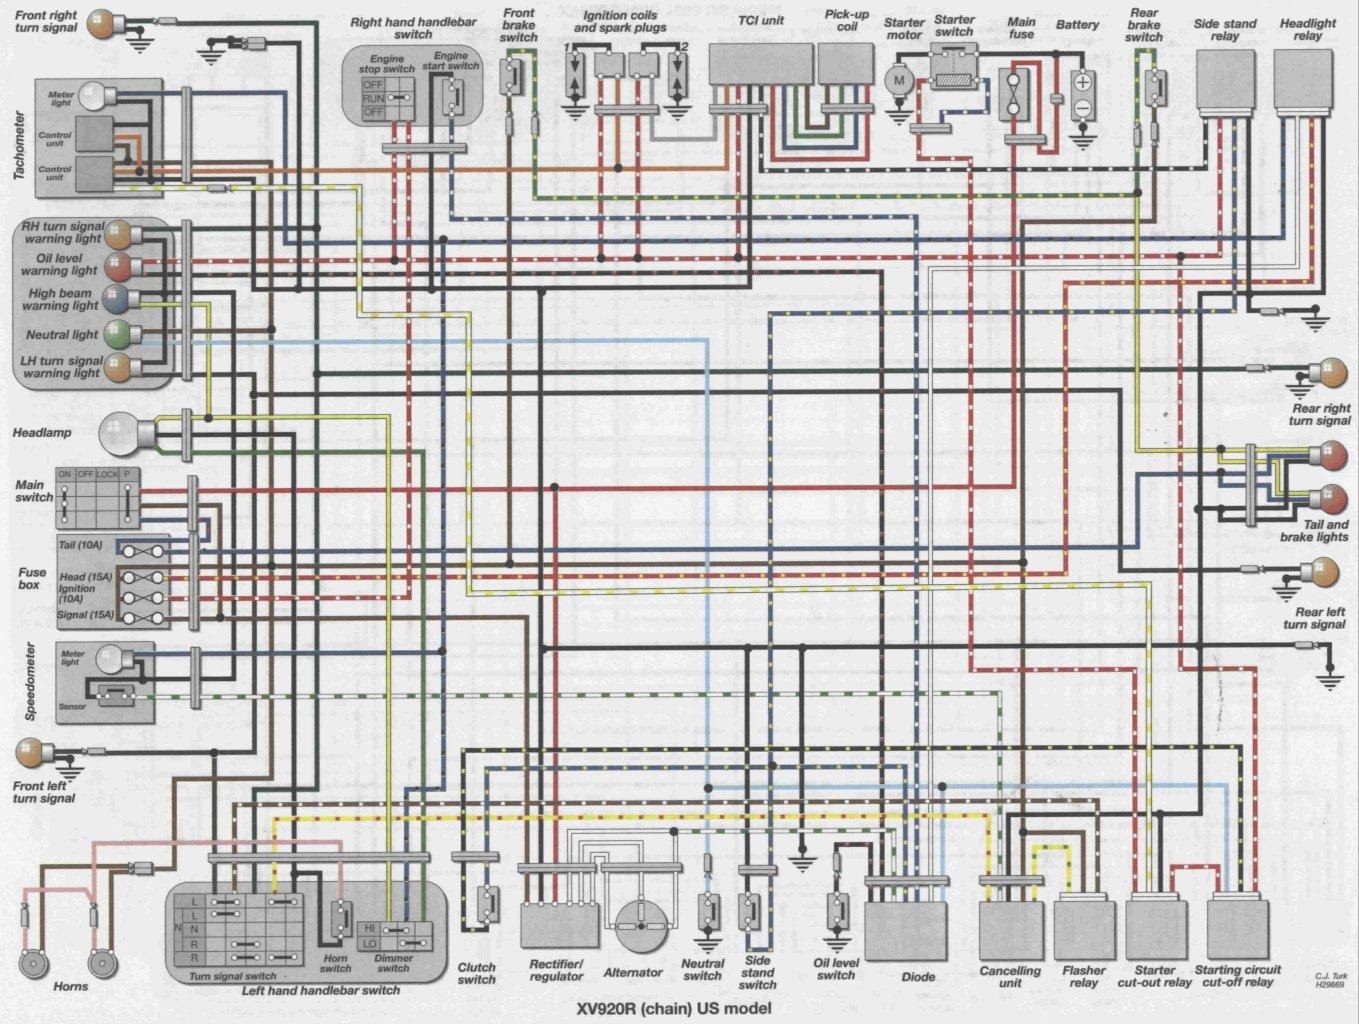 VF_0175] Wiring Harness Wiring Diagram Wiring On Bmw Motorcycle R1150Rt  Wiring Download Diagram | Bmw R1150rt Wiring Diagram Download |  | Rosz Caci Wigeg Mohammedshrine Librar Wiring 101